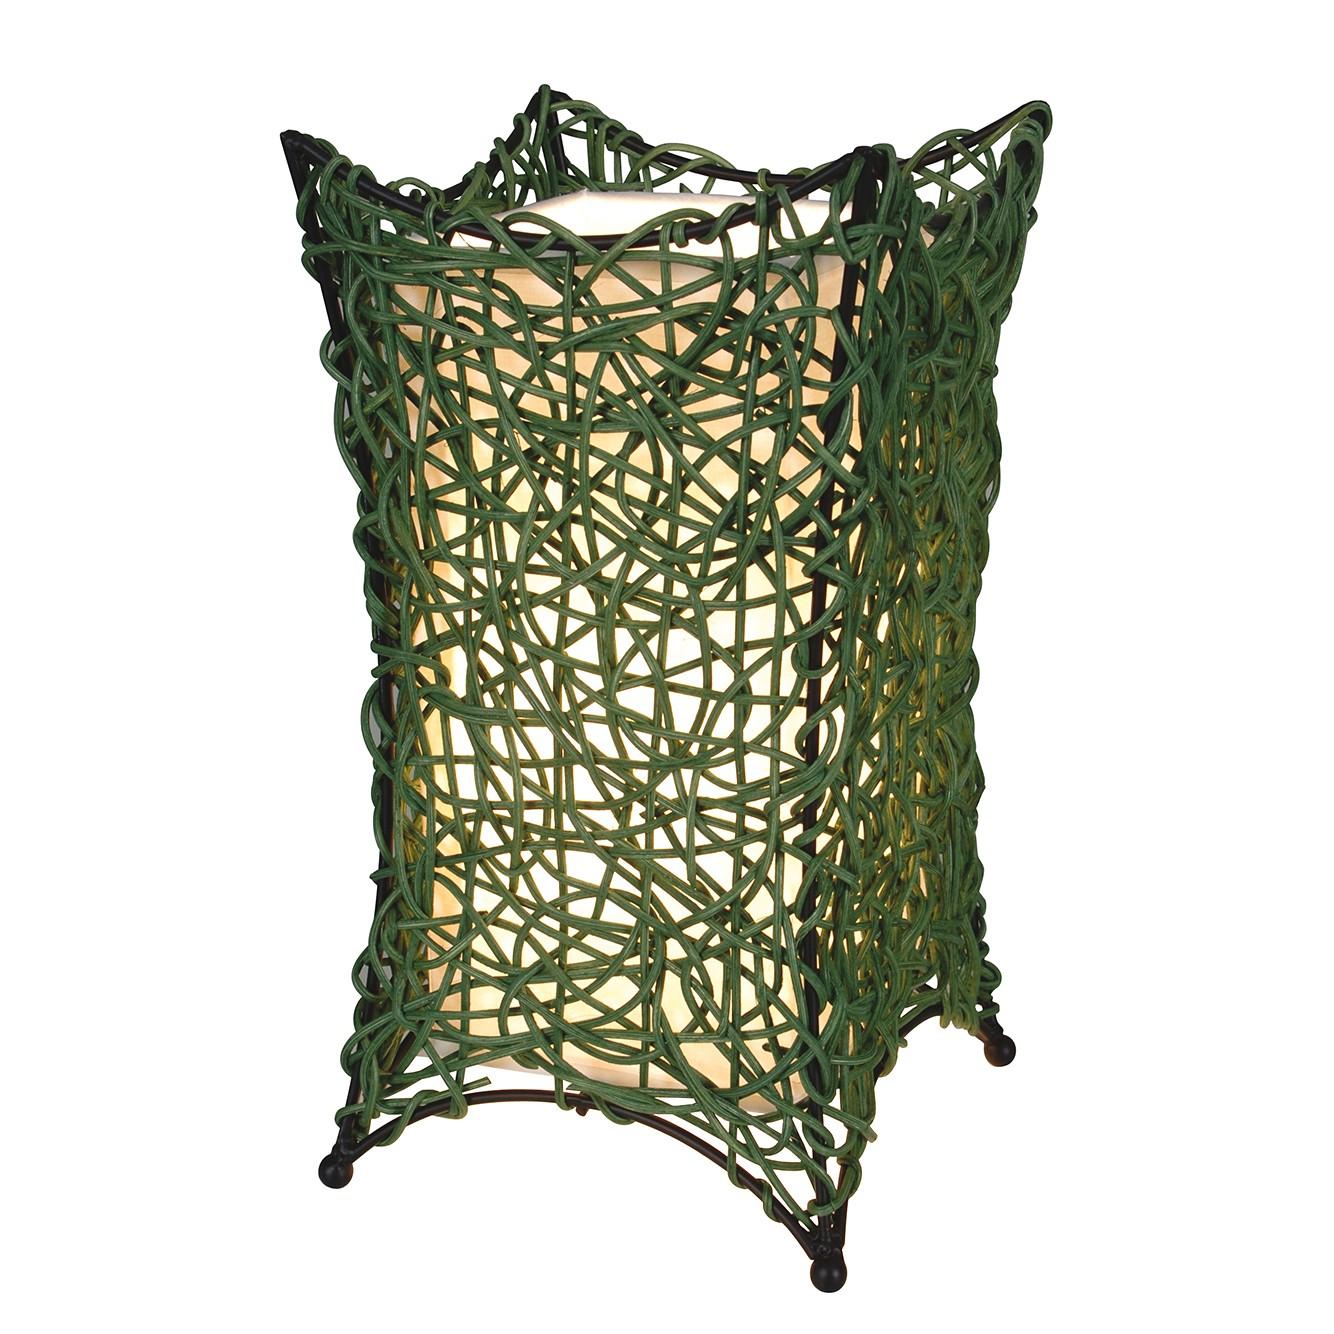 Korb-Tischleuchte Hurly-Burly Grün ● Geflecht ● 1-flammig- Näve A++